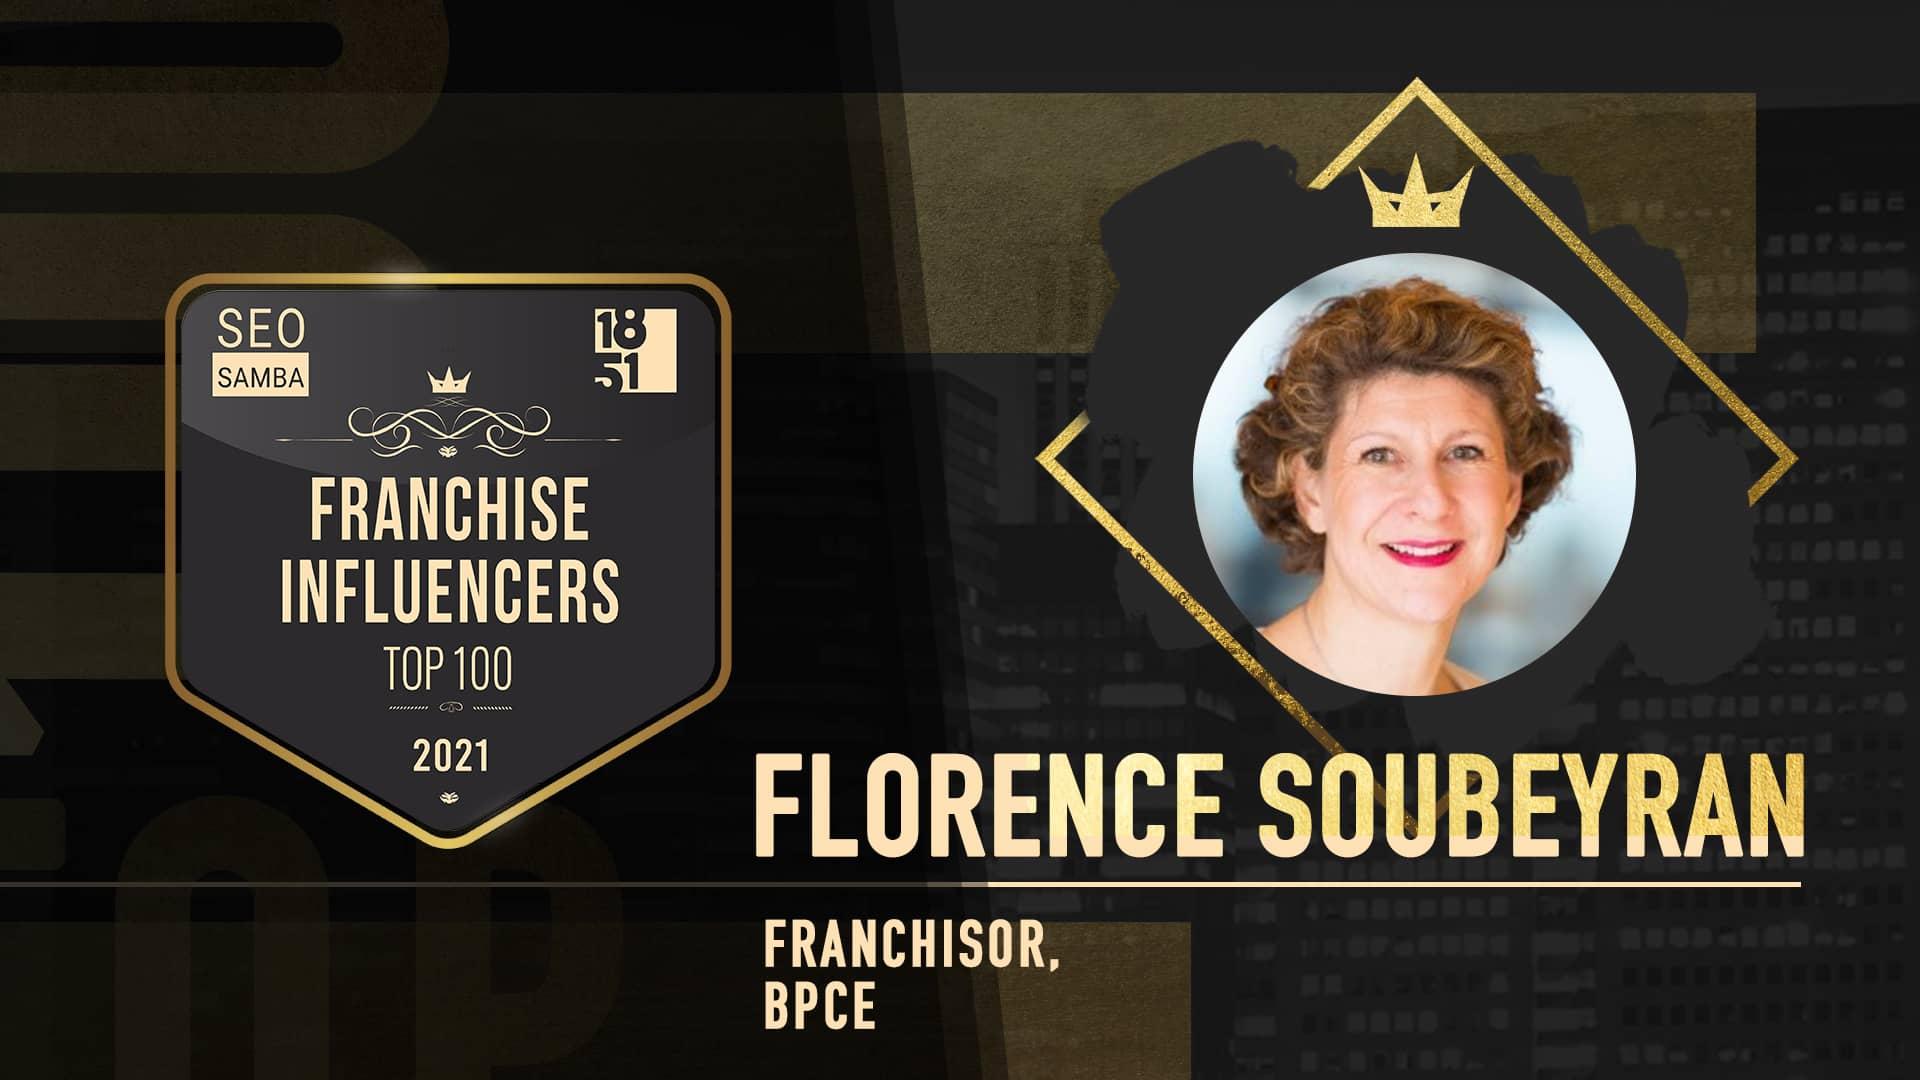 florence-soubeyran-bpce